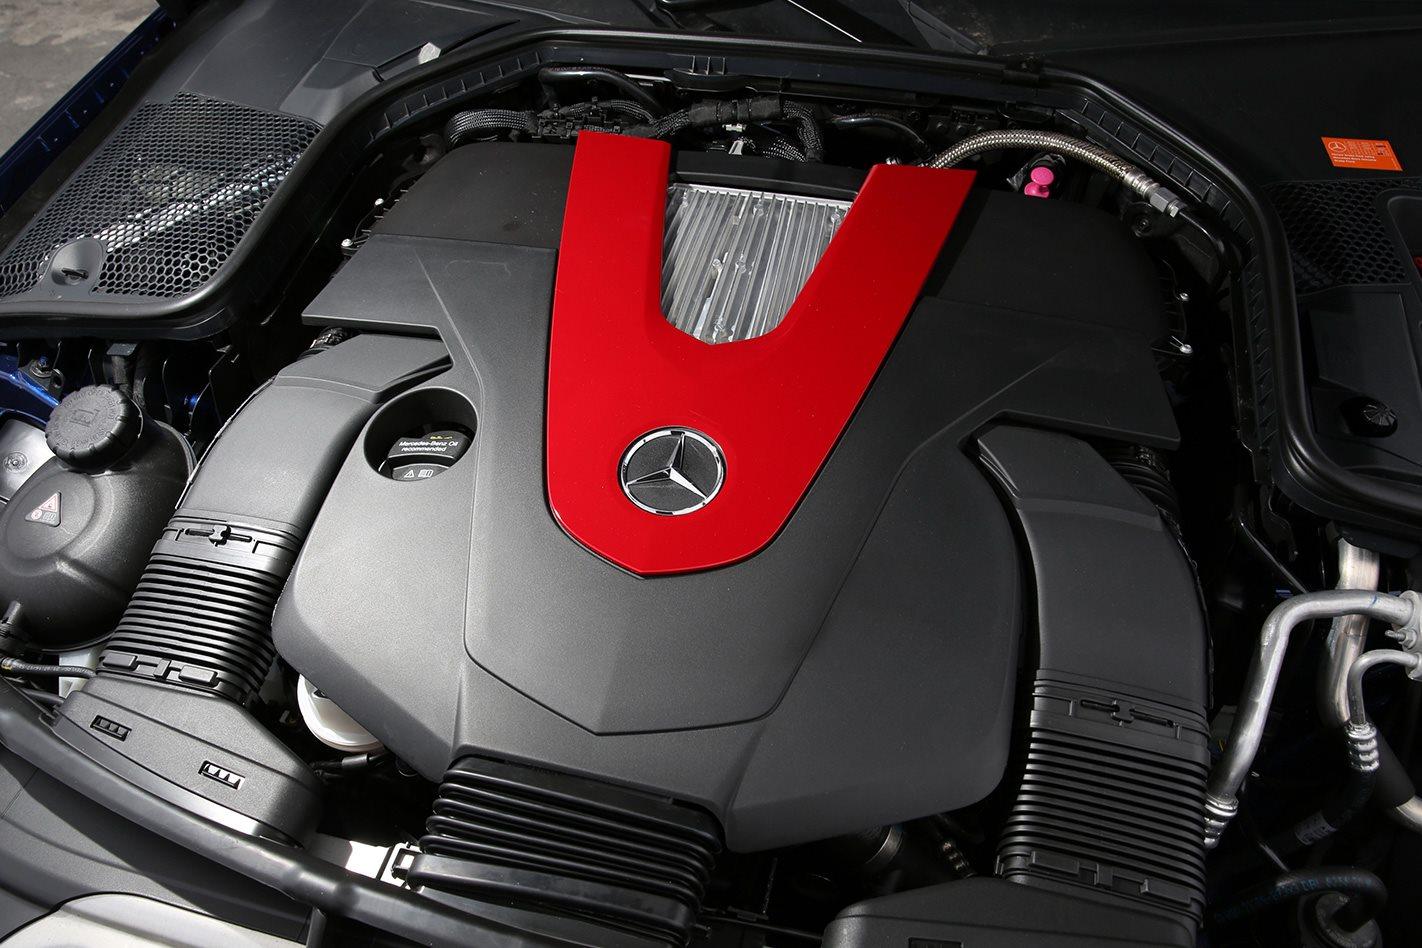 Mercedes AMG C43 engine